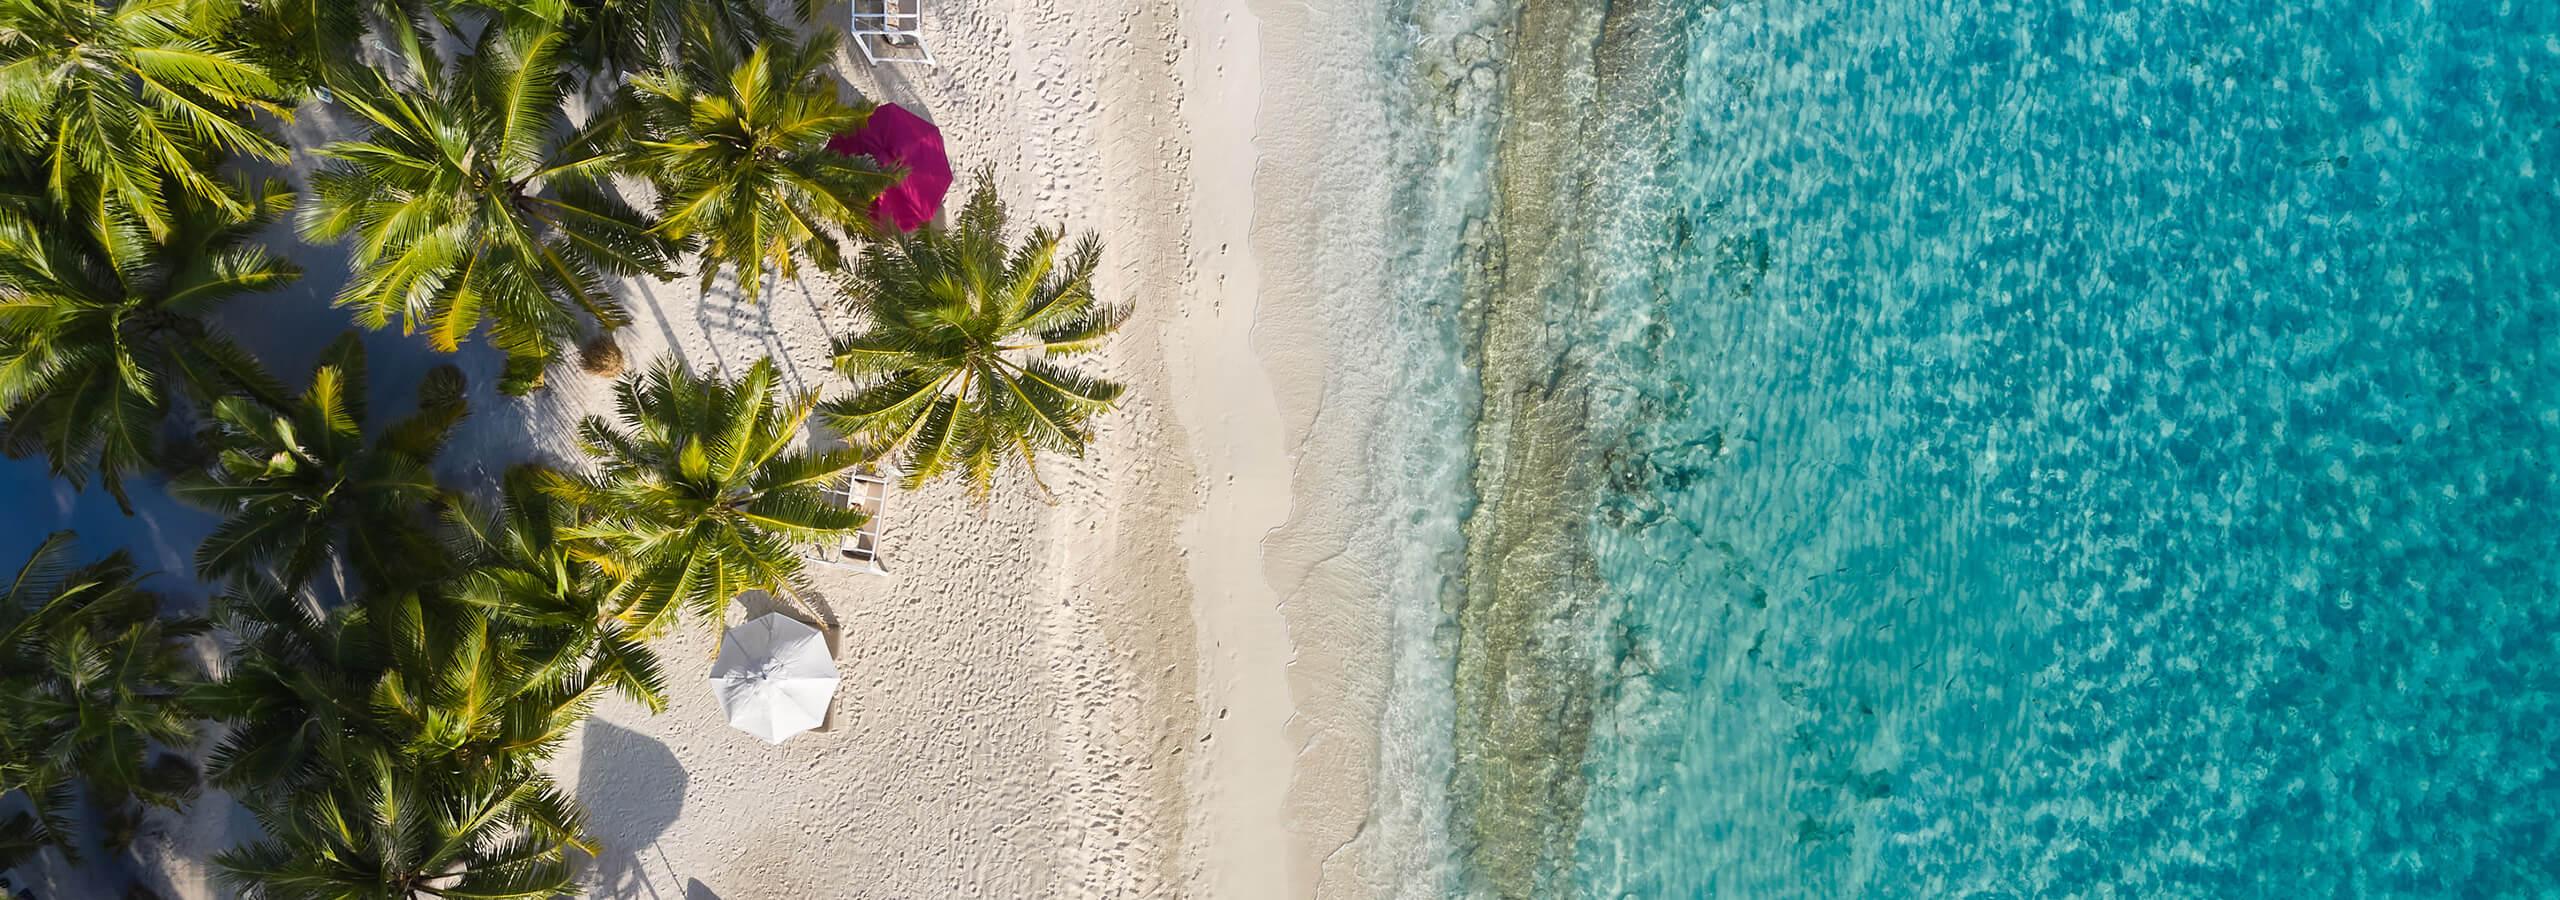 seaside-collection-luxury-resort-maldives-beach